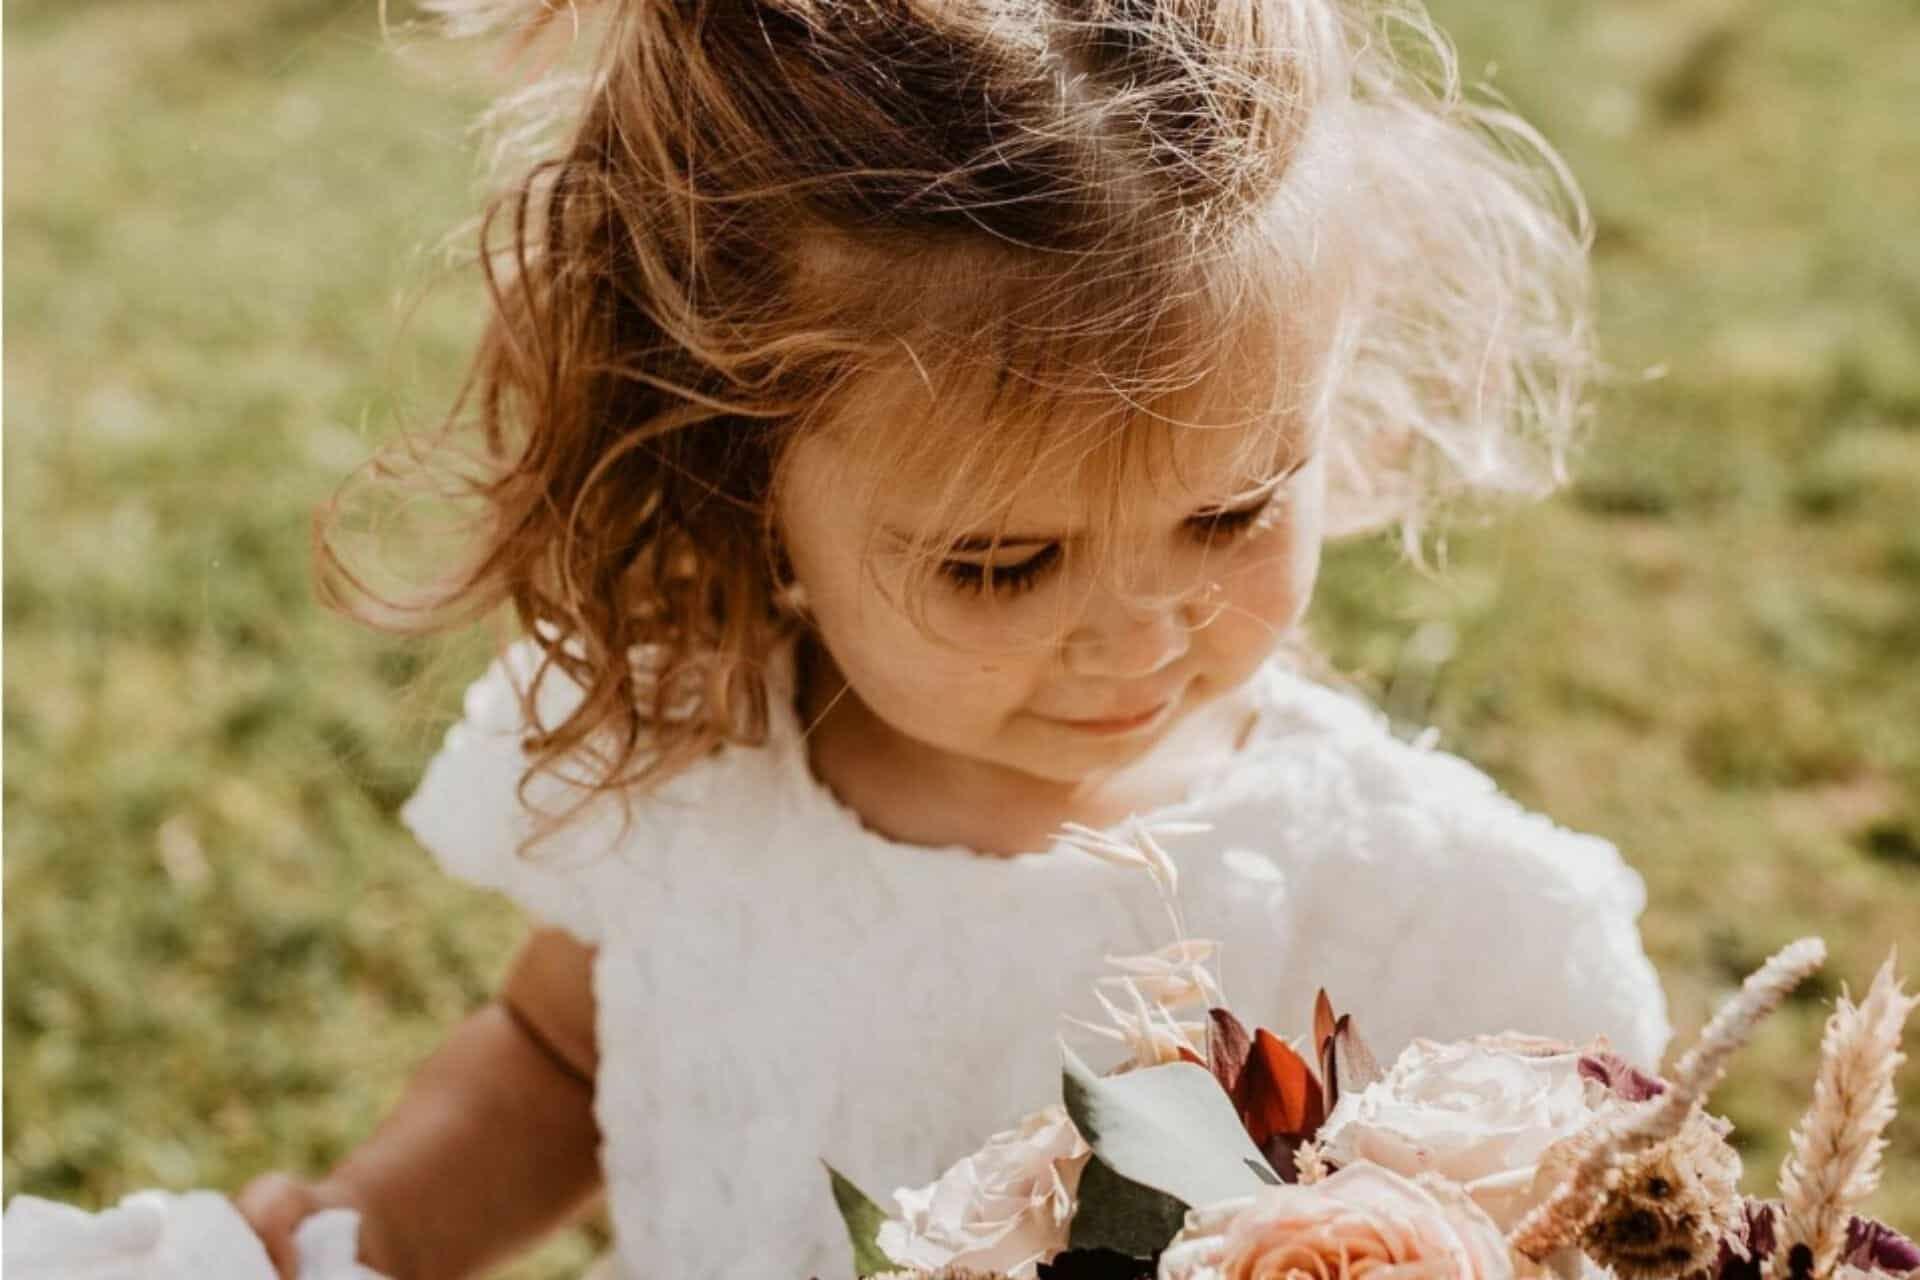 Children-in-weddings Jpg